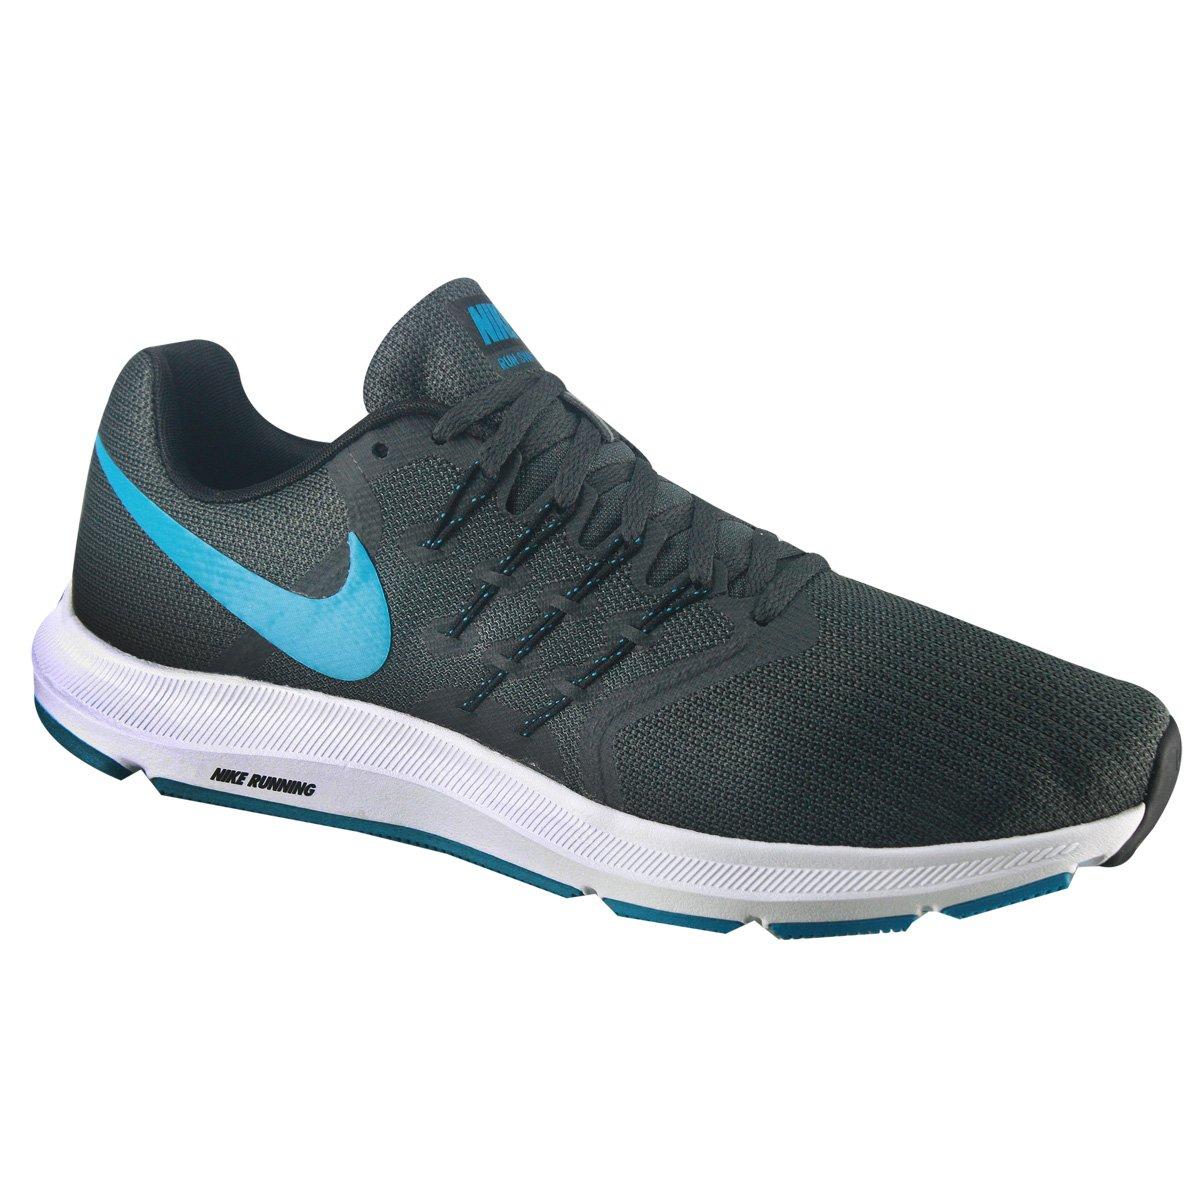 49544ebf2dd Tênis Masculino Nike Run Swift 908989-014 - Preto Azul - Botas ...